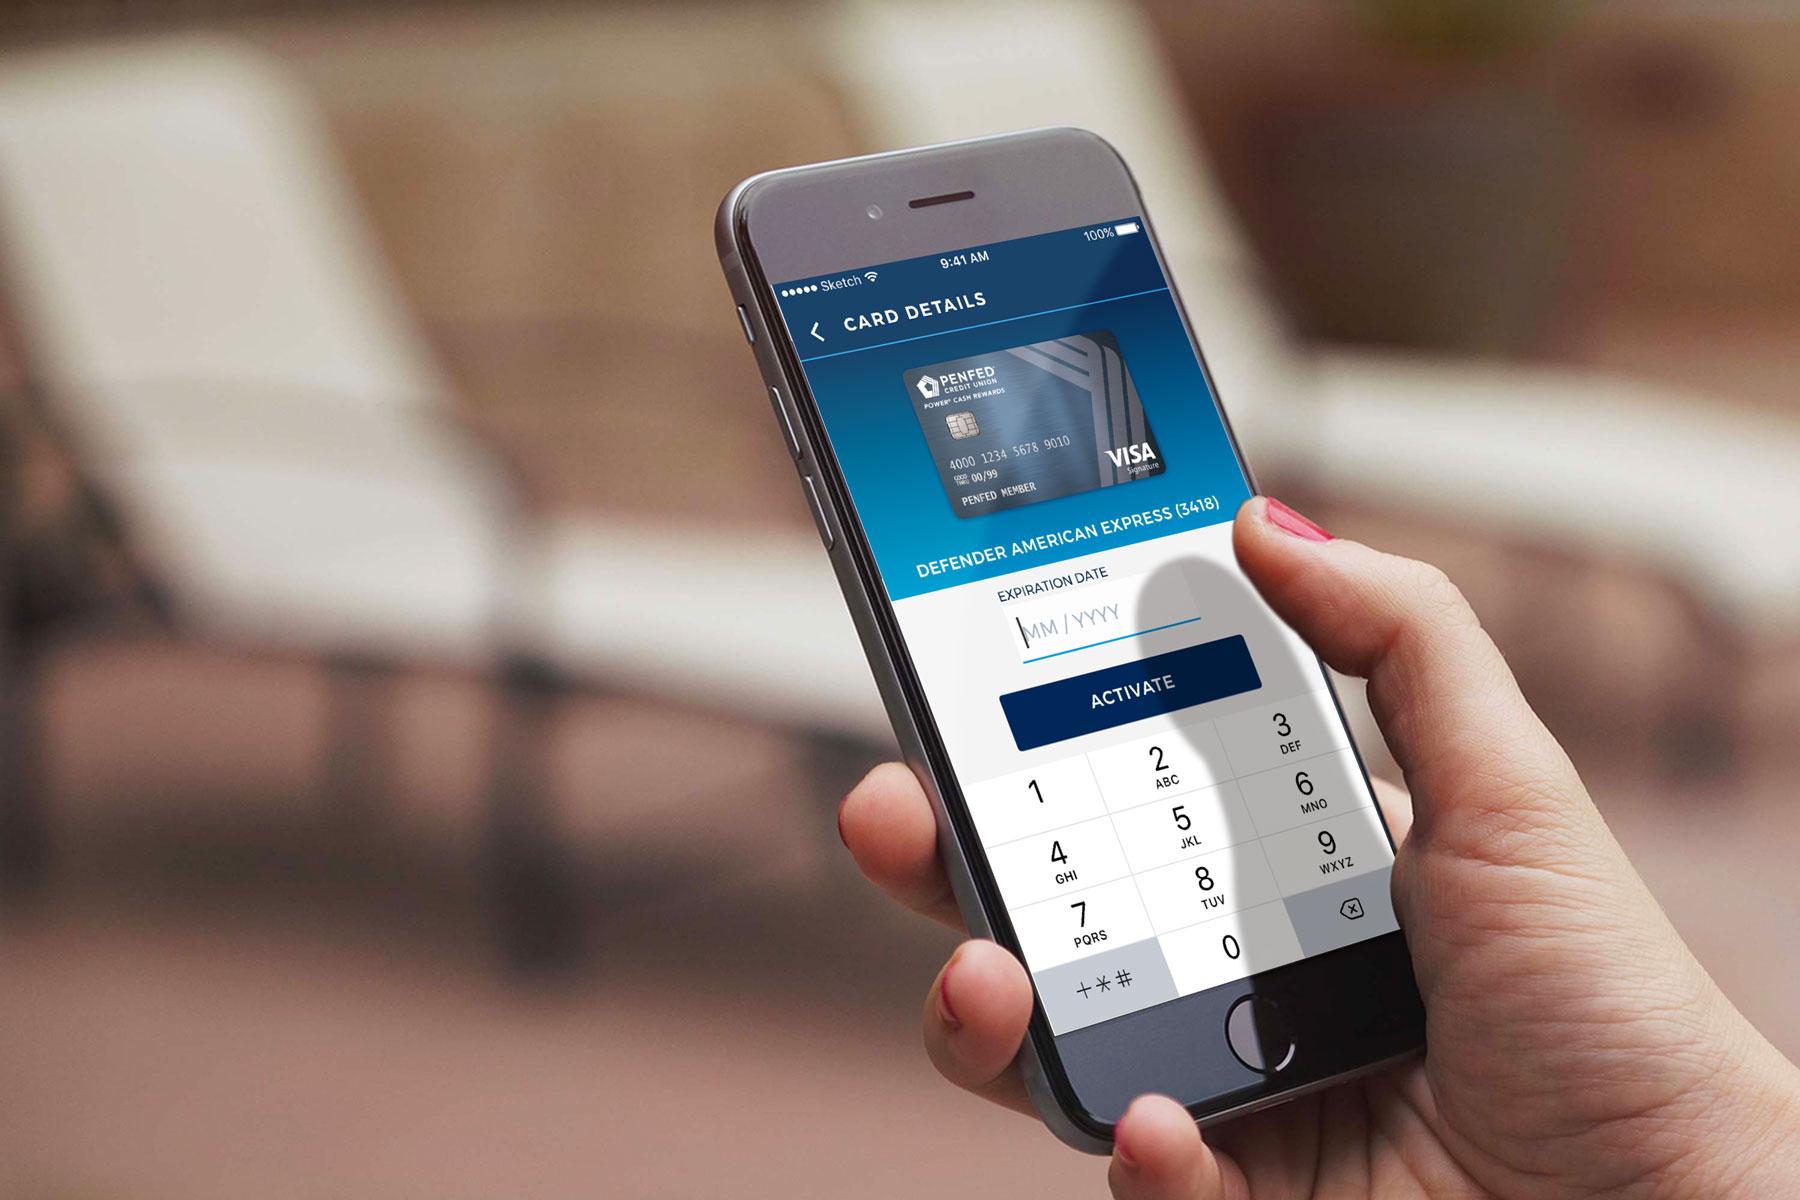 Penfed Phone Number >> Bringing Mobile Banking To Penfed Customers Jordan Cooke